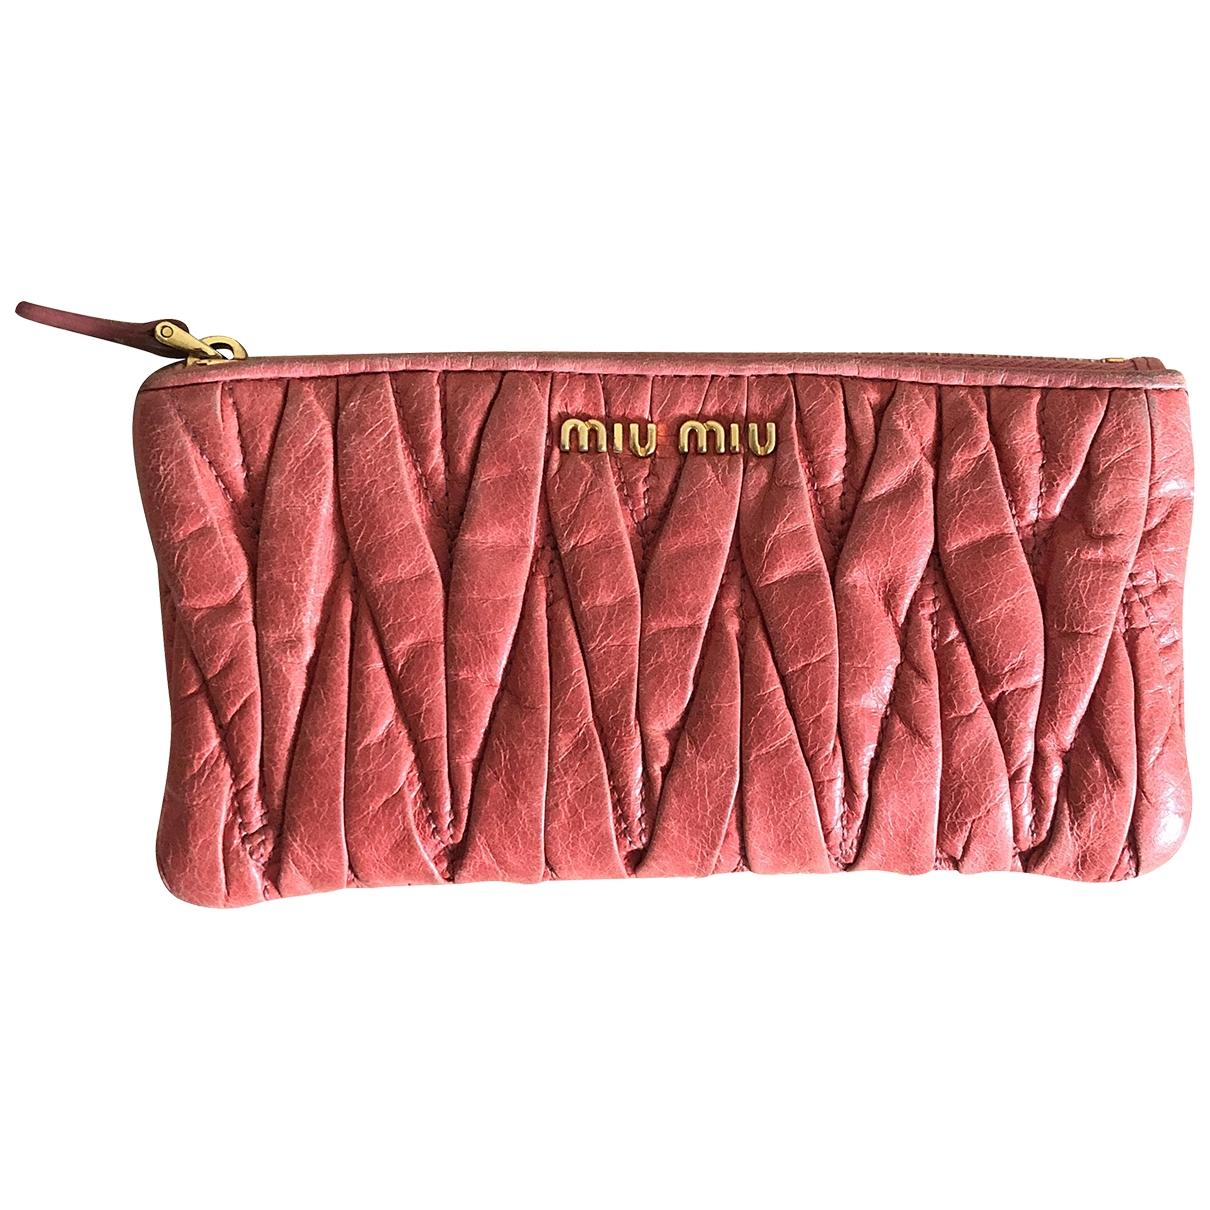 Miu Miu - Petite maroquinerie   pour femme en cuir - rose